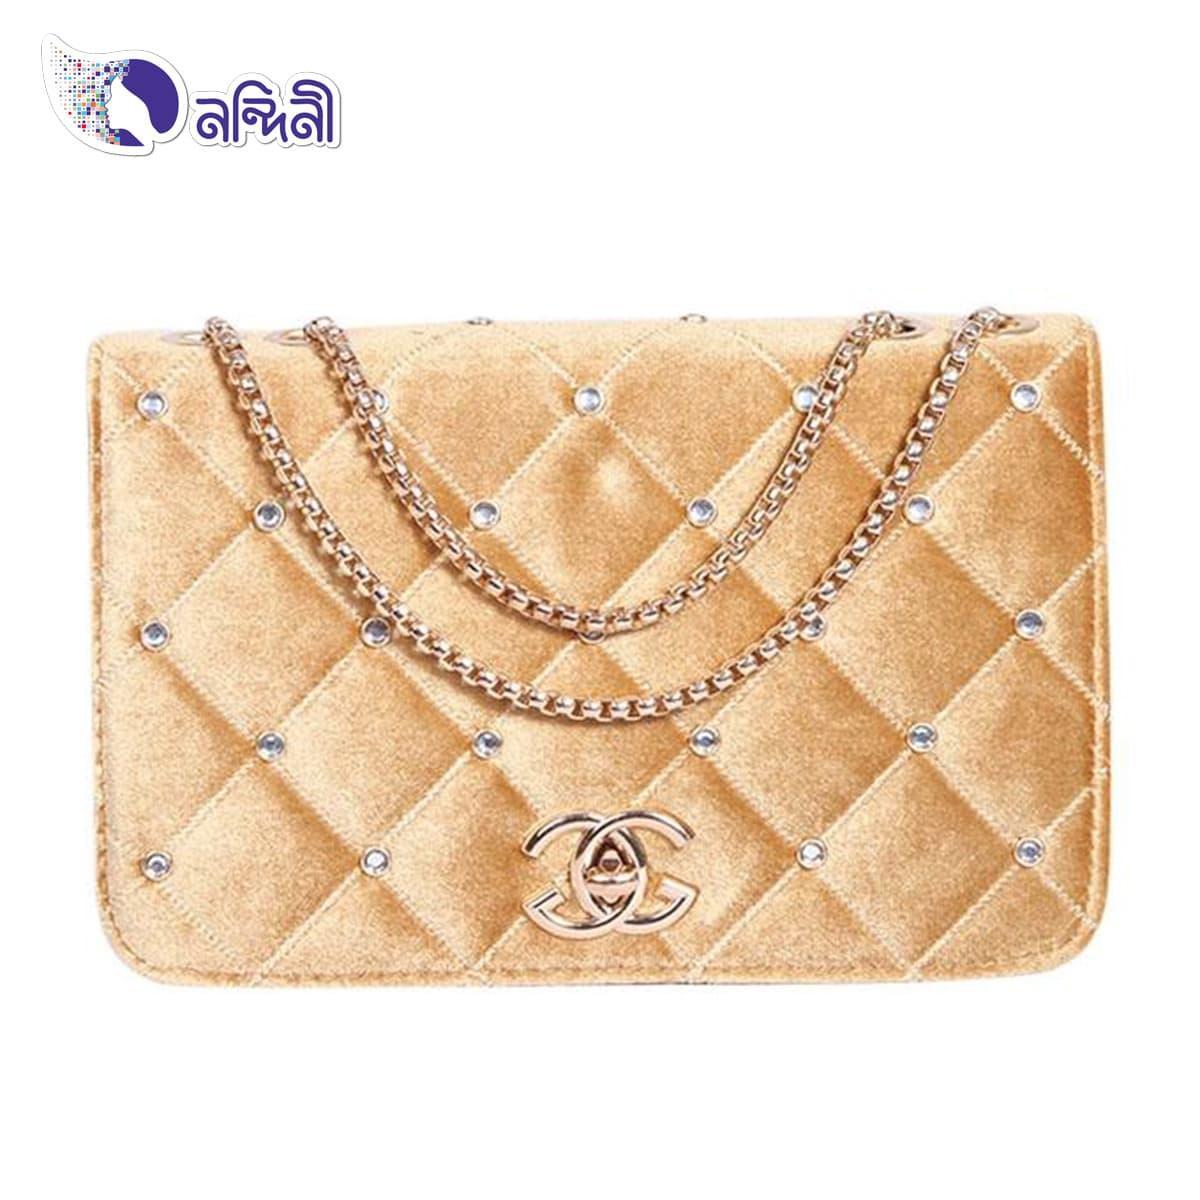 c2f48ad7f Ladies Handbags & Women's Handbags In Bangladesh At Best Price ...